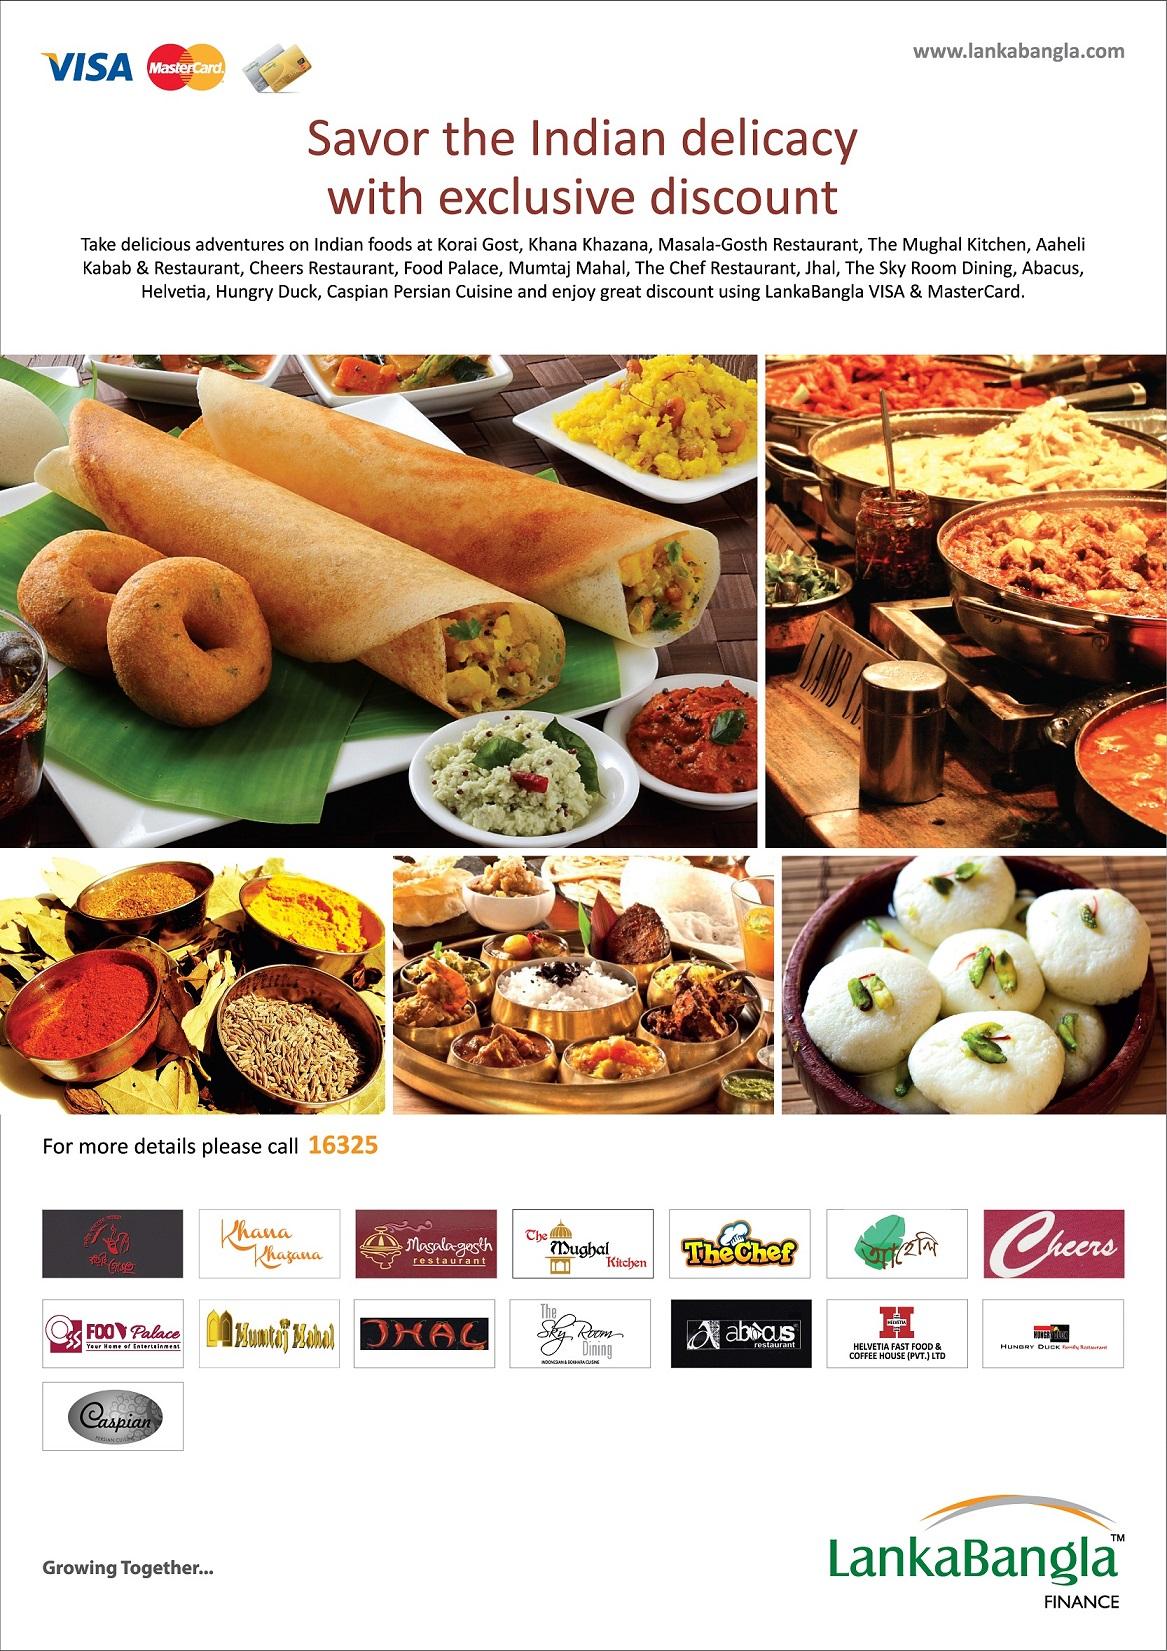 Lanka bangla credit card for Akbar cuisine of india coupon